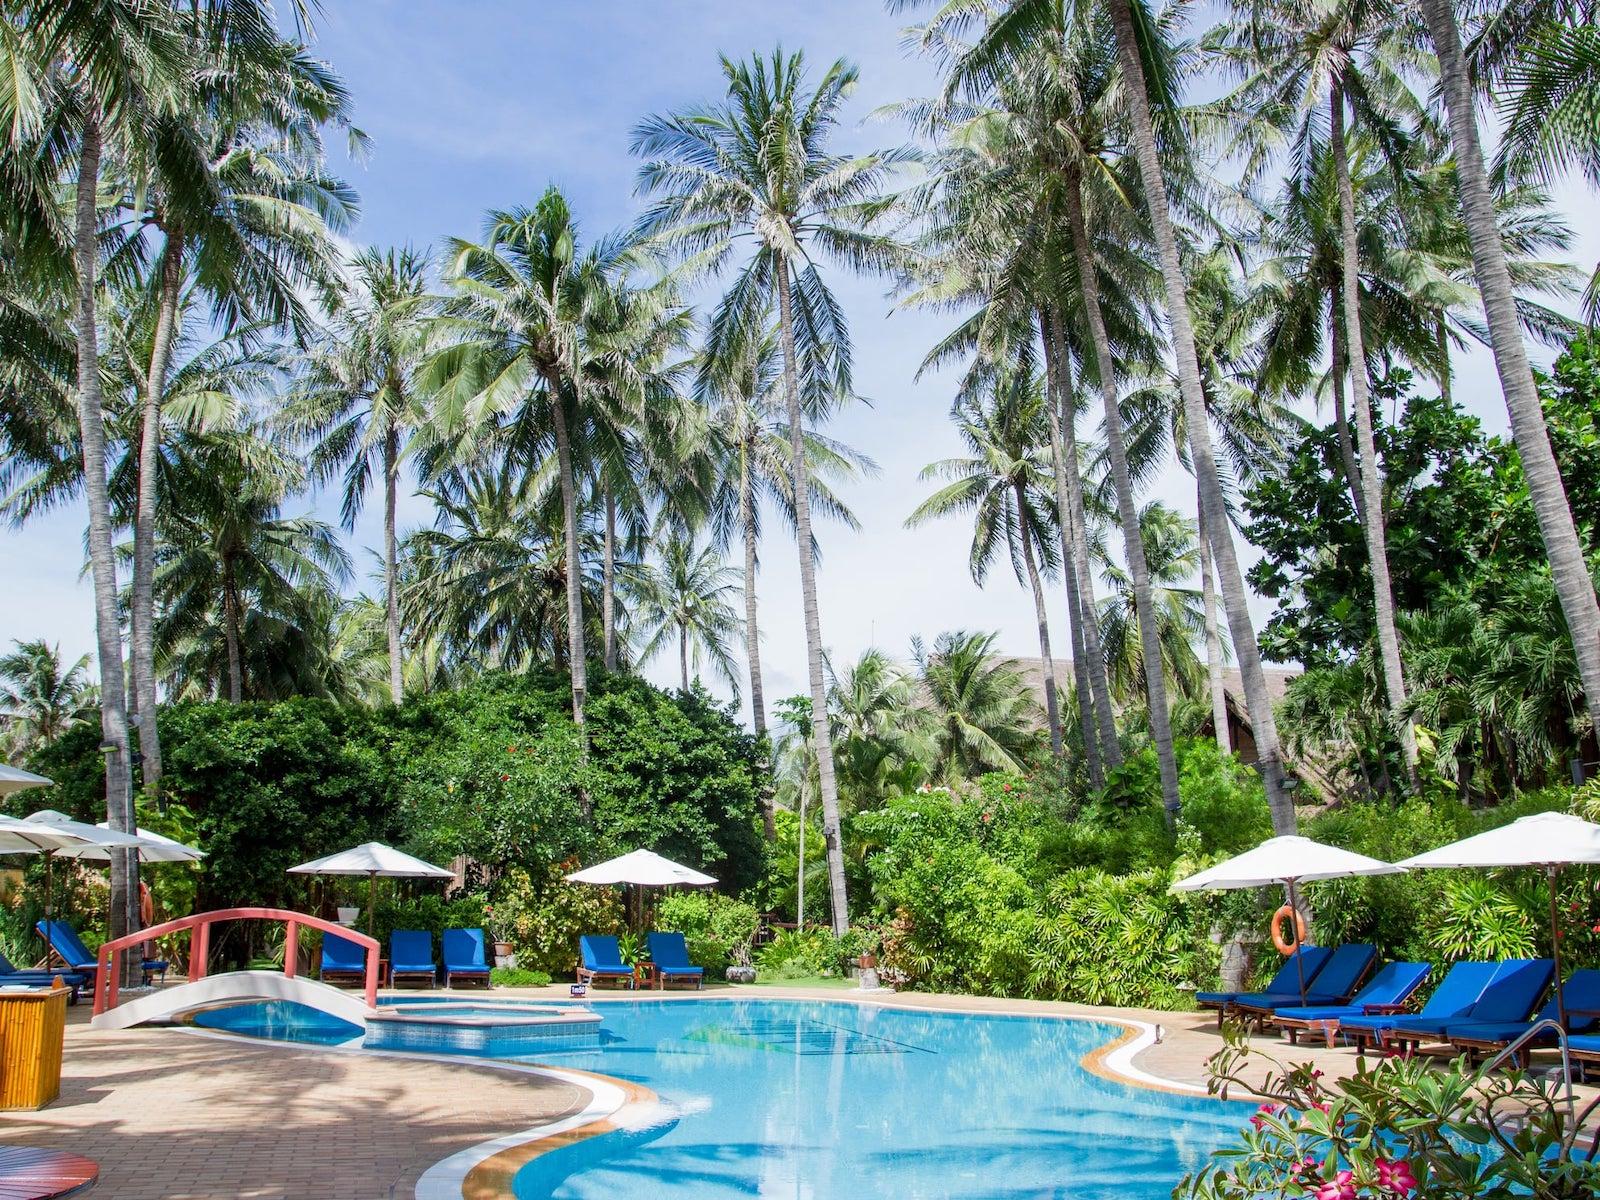 Image of the pool at the Bamboo Village Beach Resort & Spa in Mui Ne, Vietnam